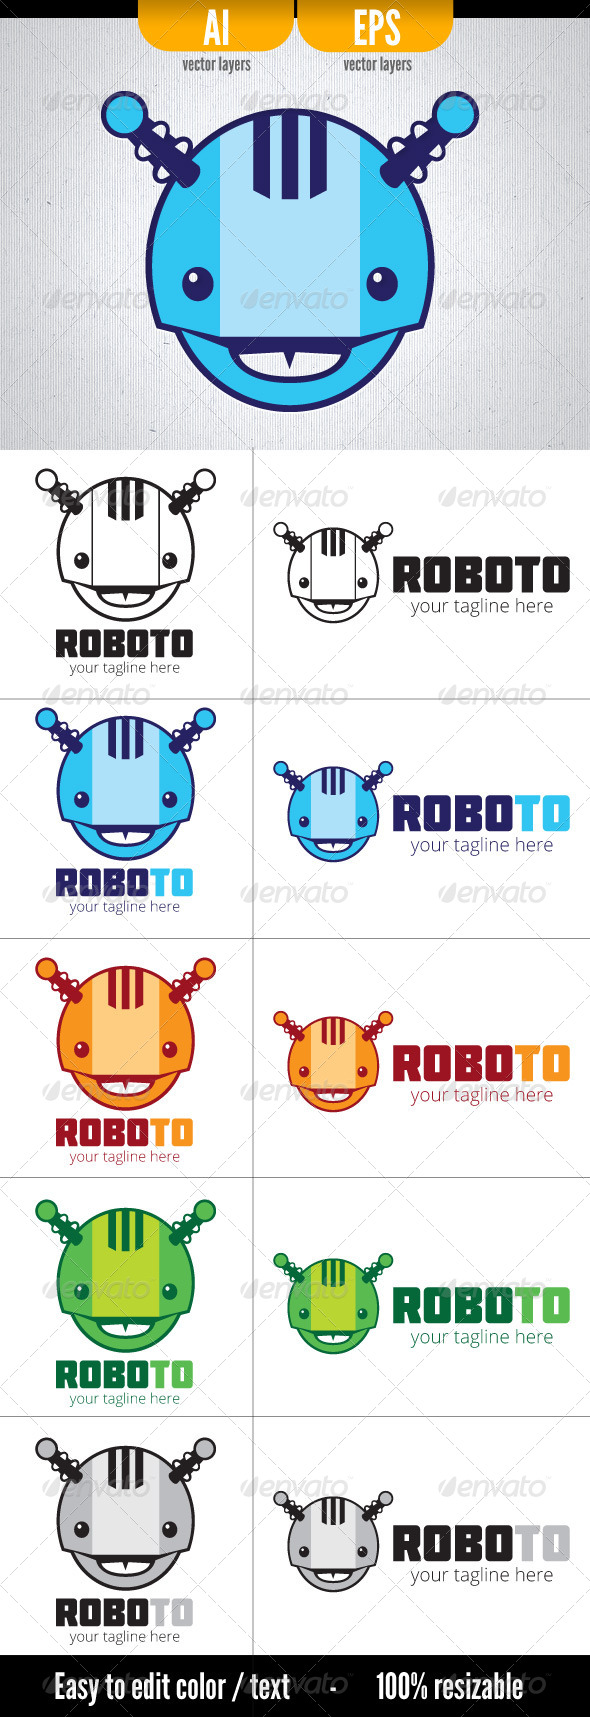 GraphicRiver Roboto 4864847